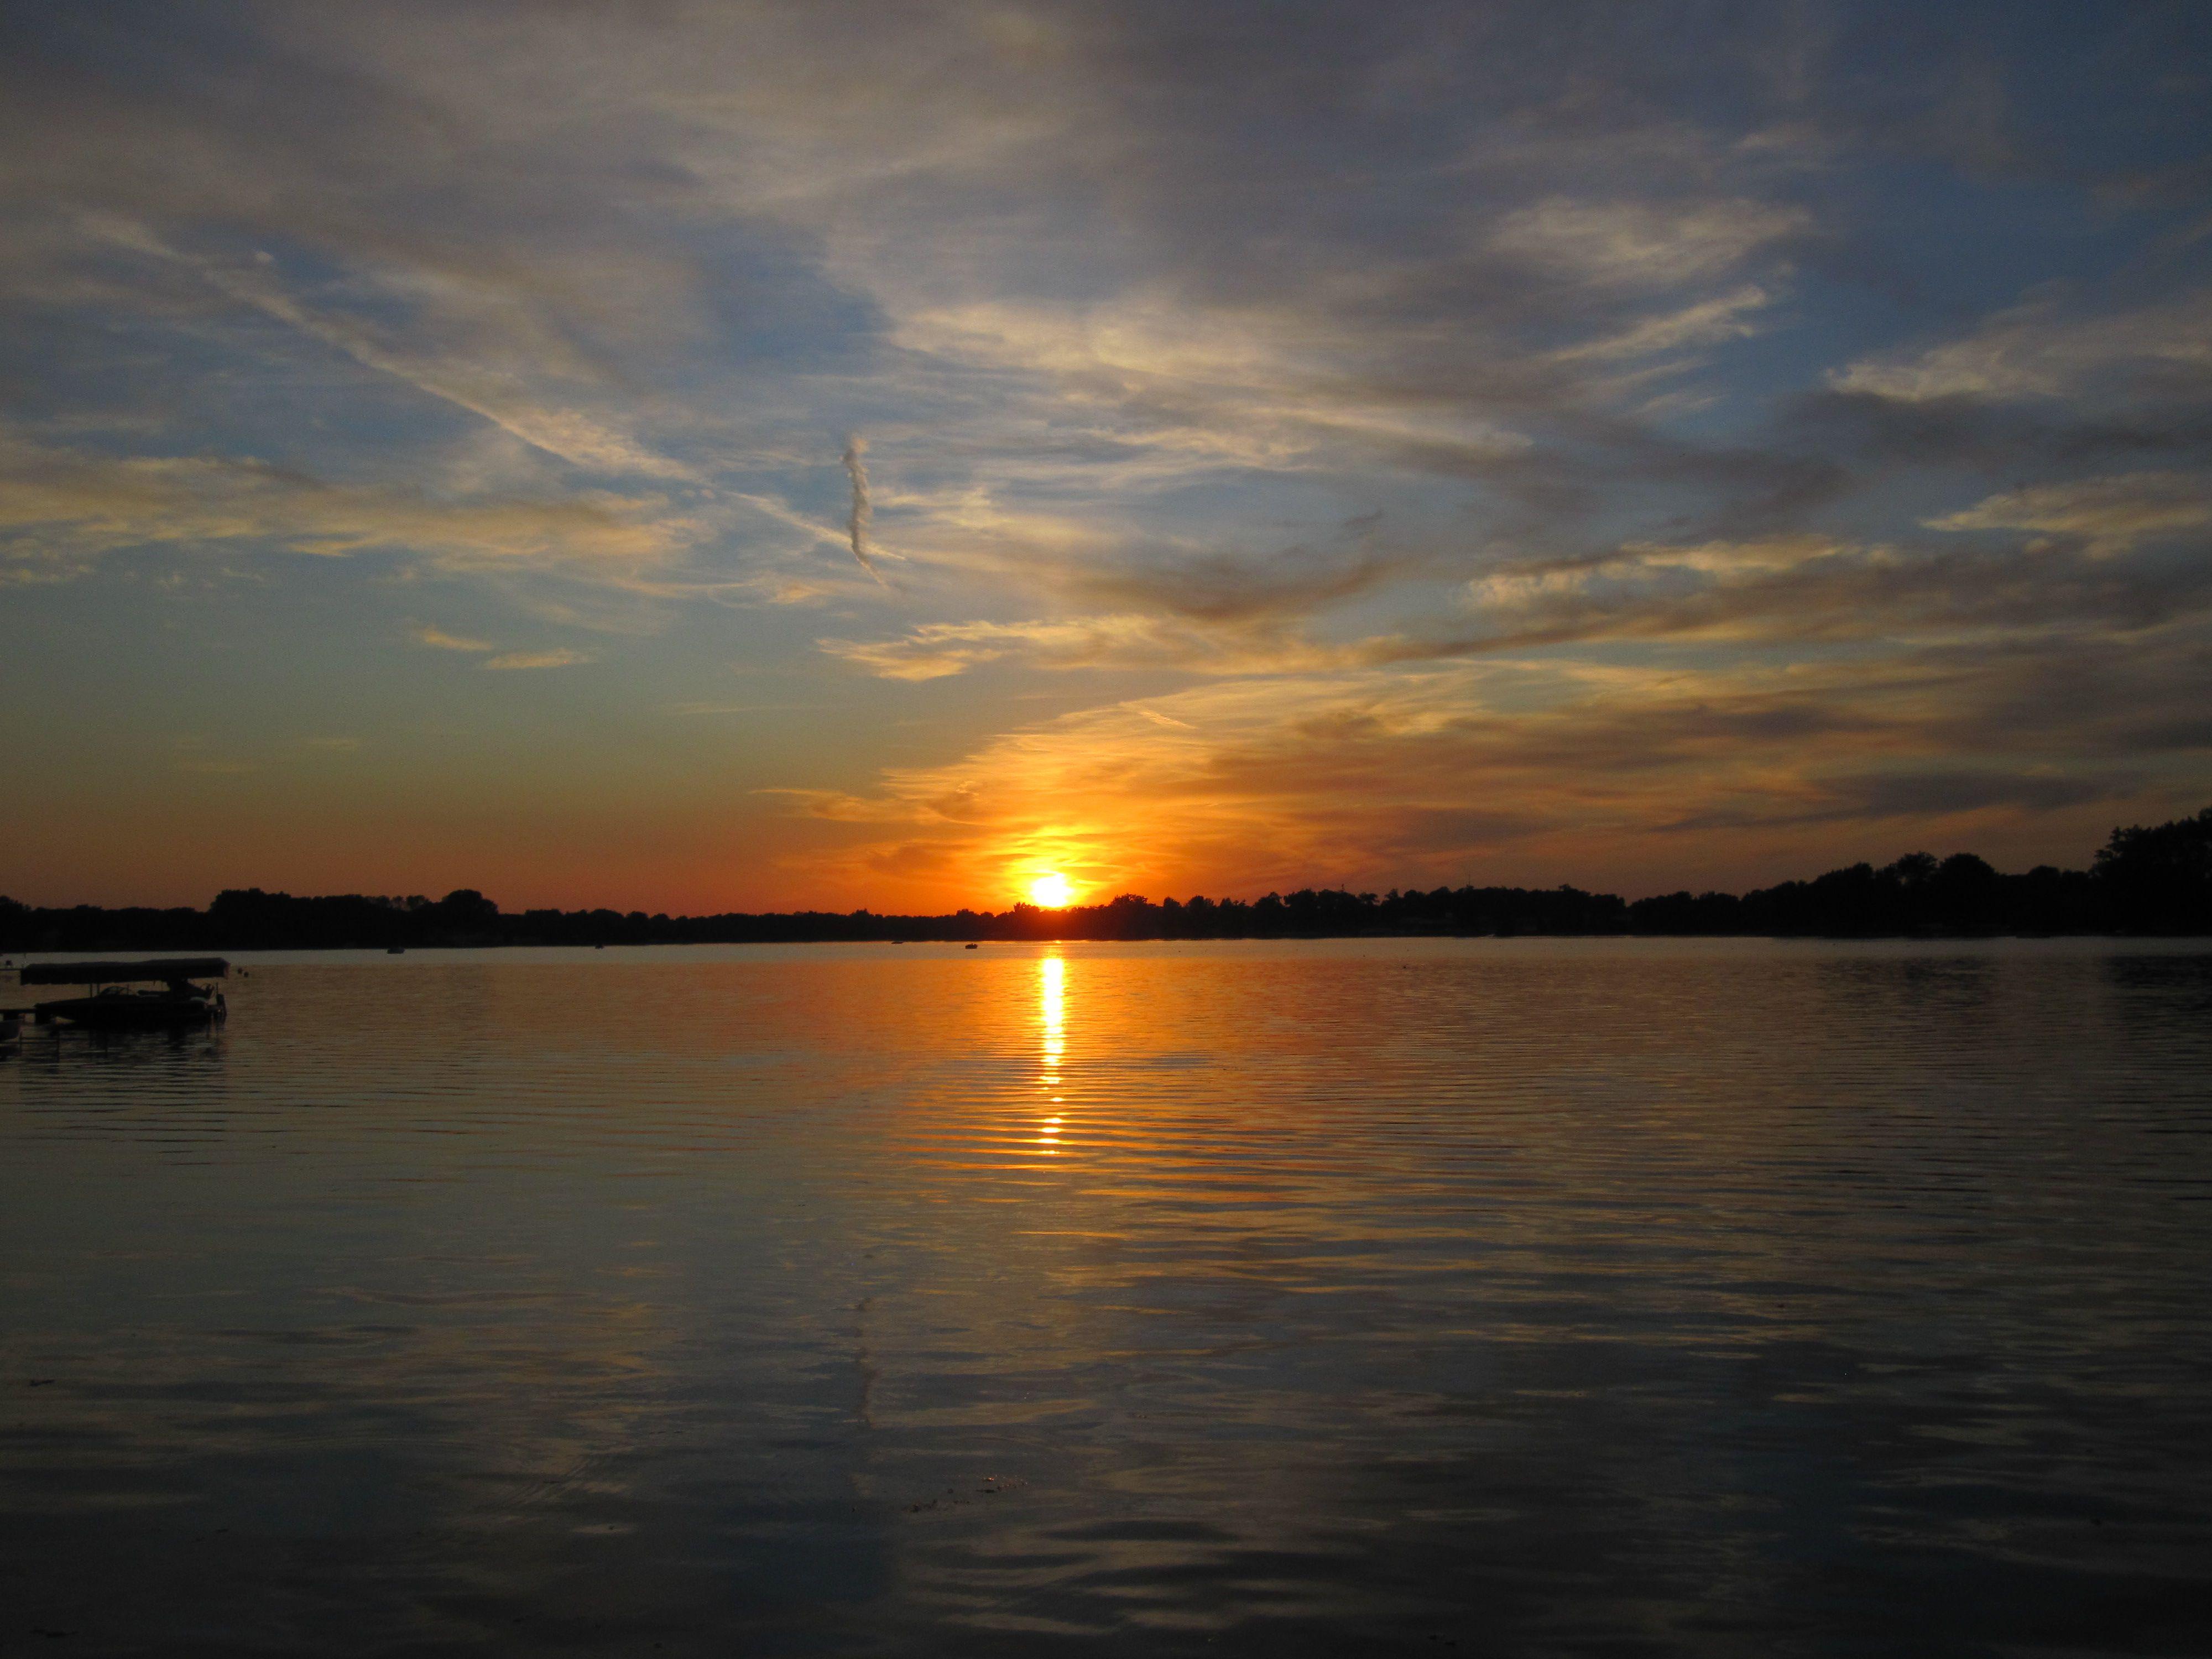 Sunset at Winona Lake, Indiana